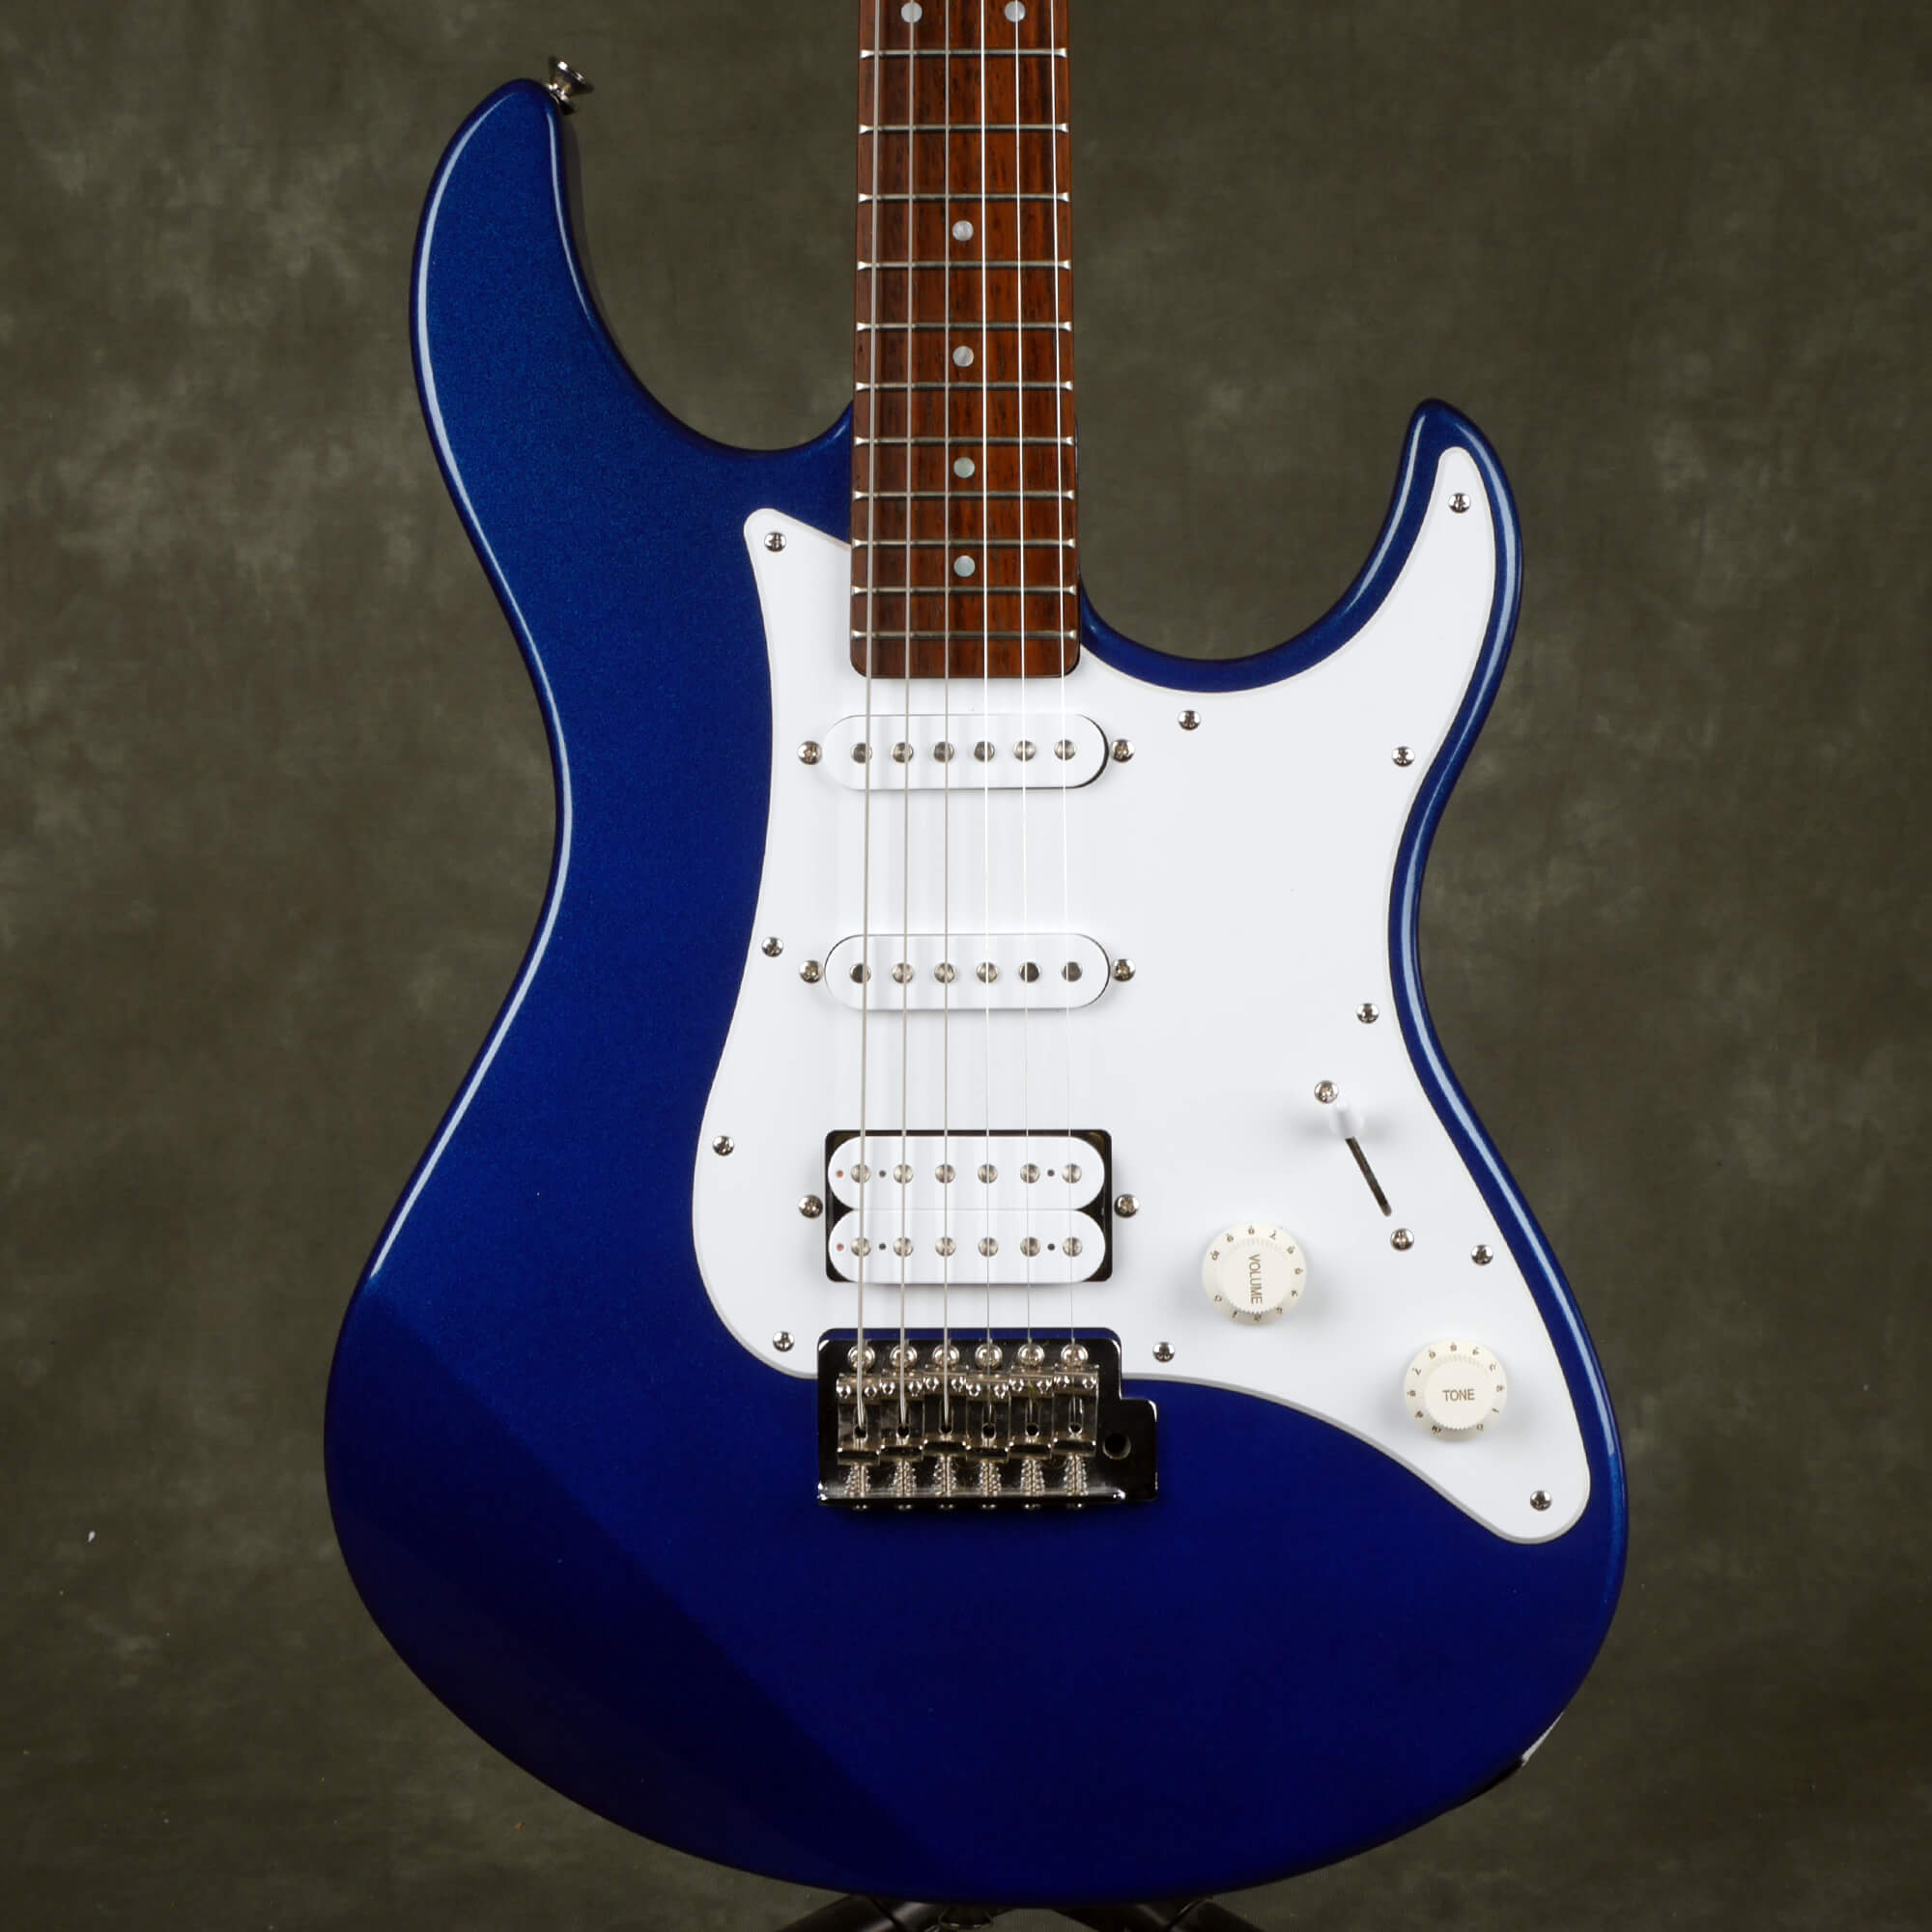 Yamaha Pacifica PAC012 HSS Electric Guitar - Dark Blue Metallic - 2nd Hand